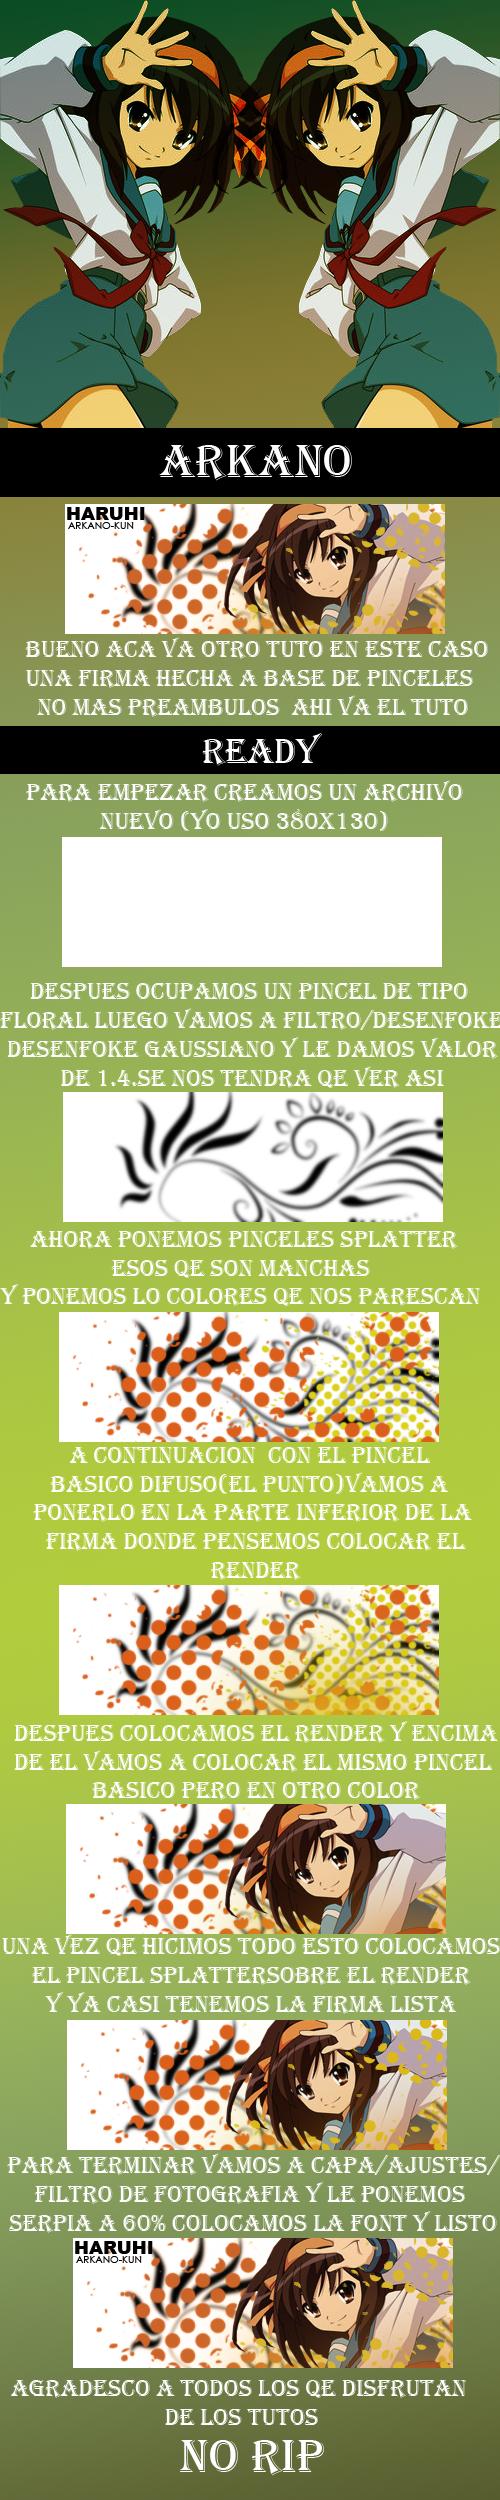 TUTORIAL 4 HARUHI Fondo Blanco (firma para principiantes) Tuto_6_haruhi_sig_blanco_princ_by_ARkanoID01